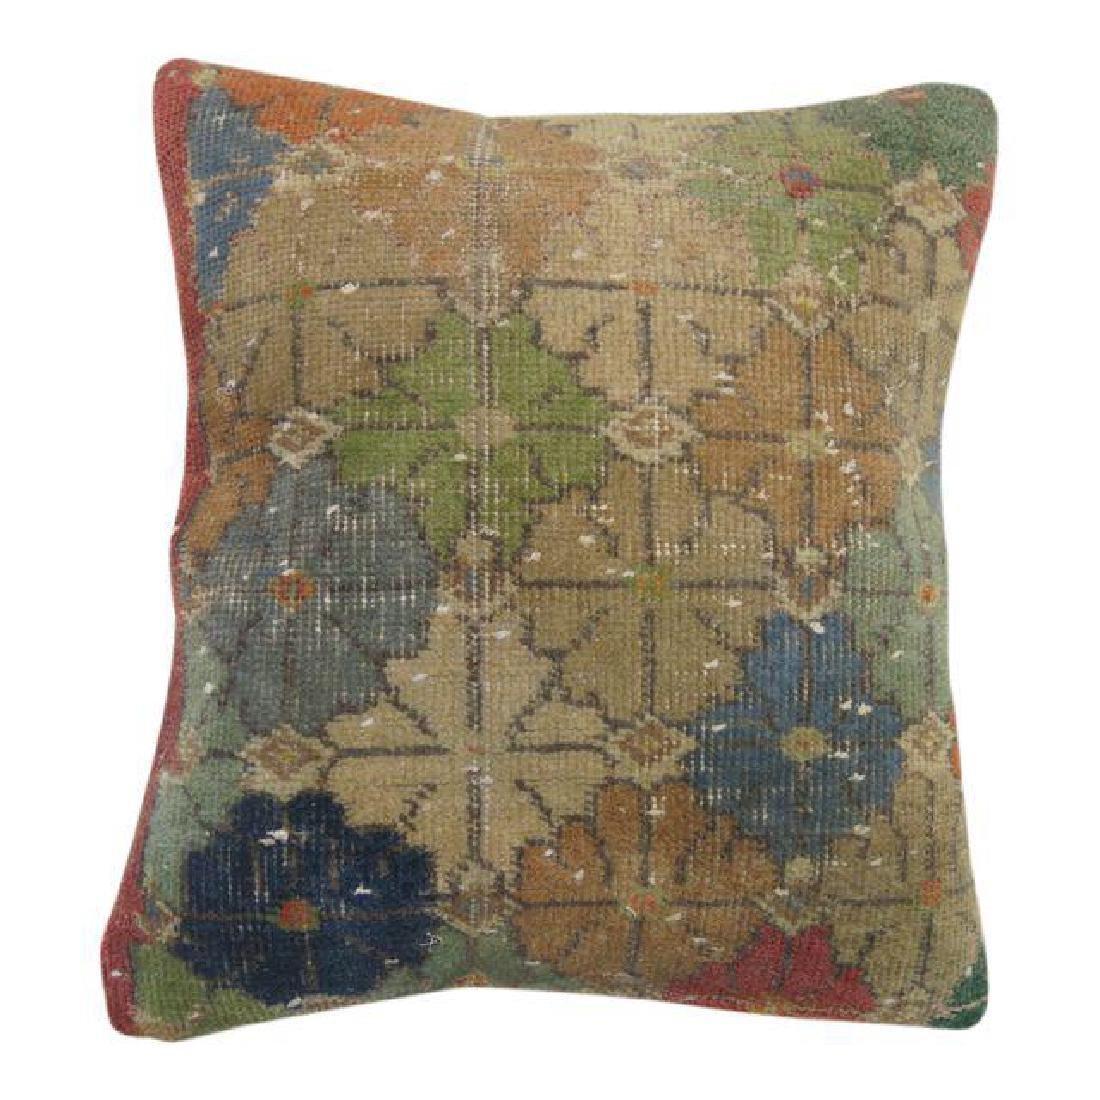 Turkish Boho Chic Deco Rug Pillow 1.8x1.6